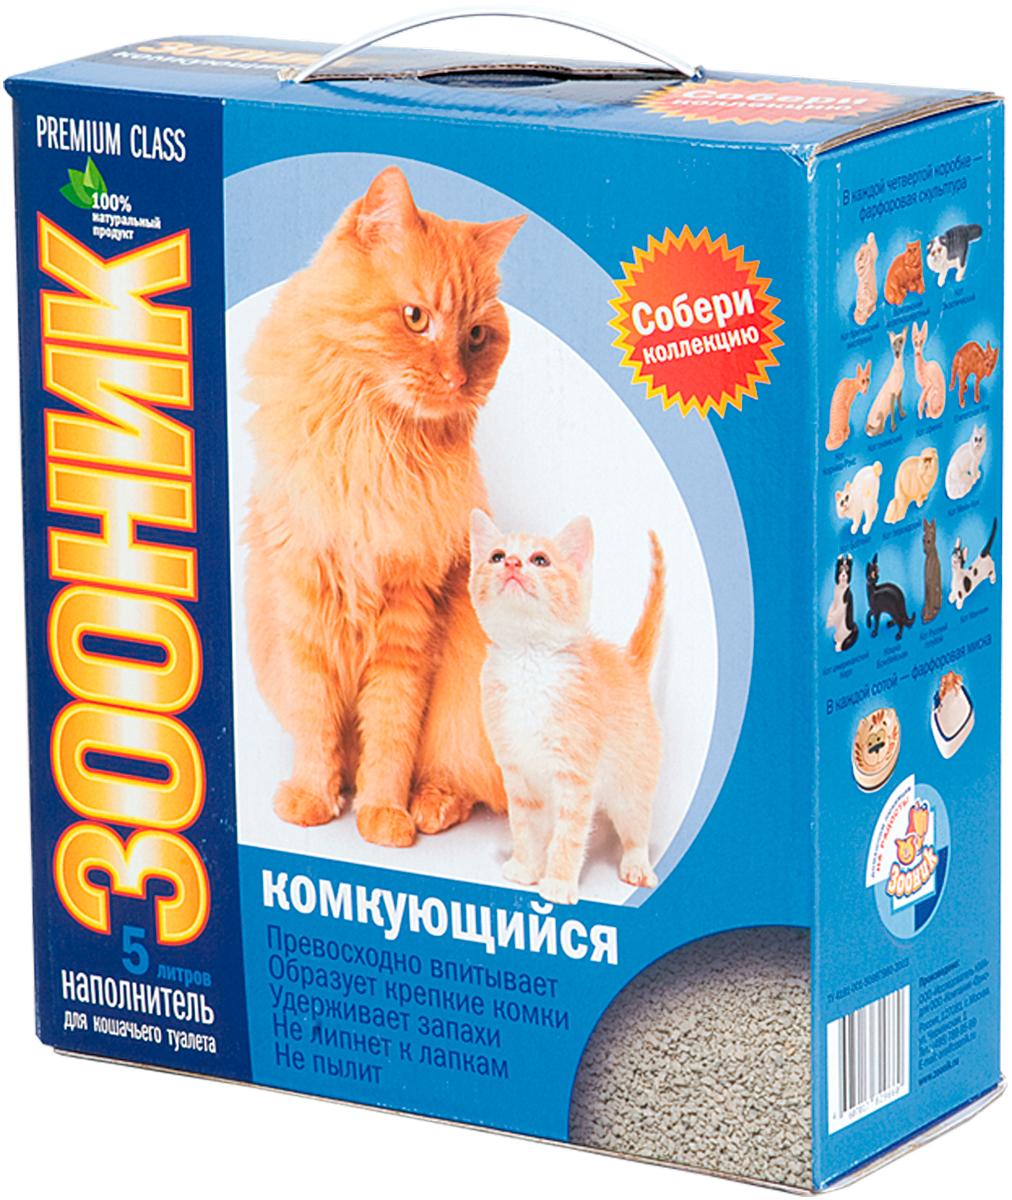 Зооник люкс комкующийся - наполнитель комкующийся для туалета кошек (5 л) фото